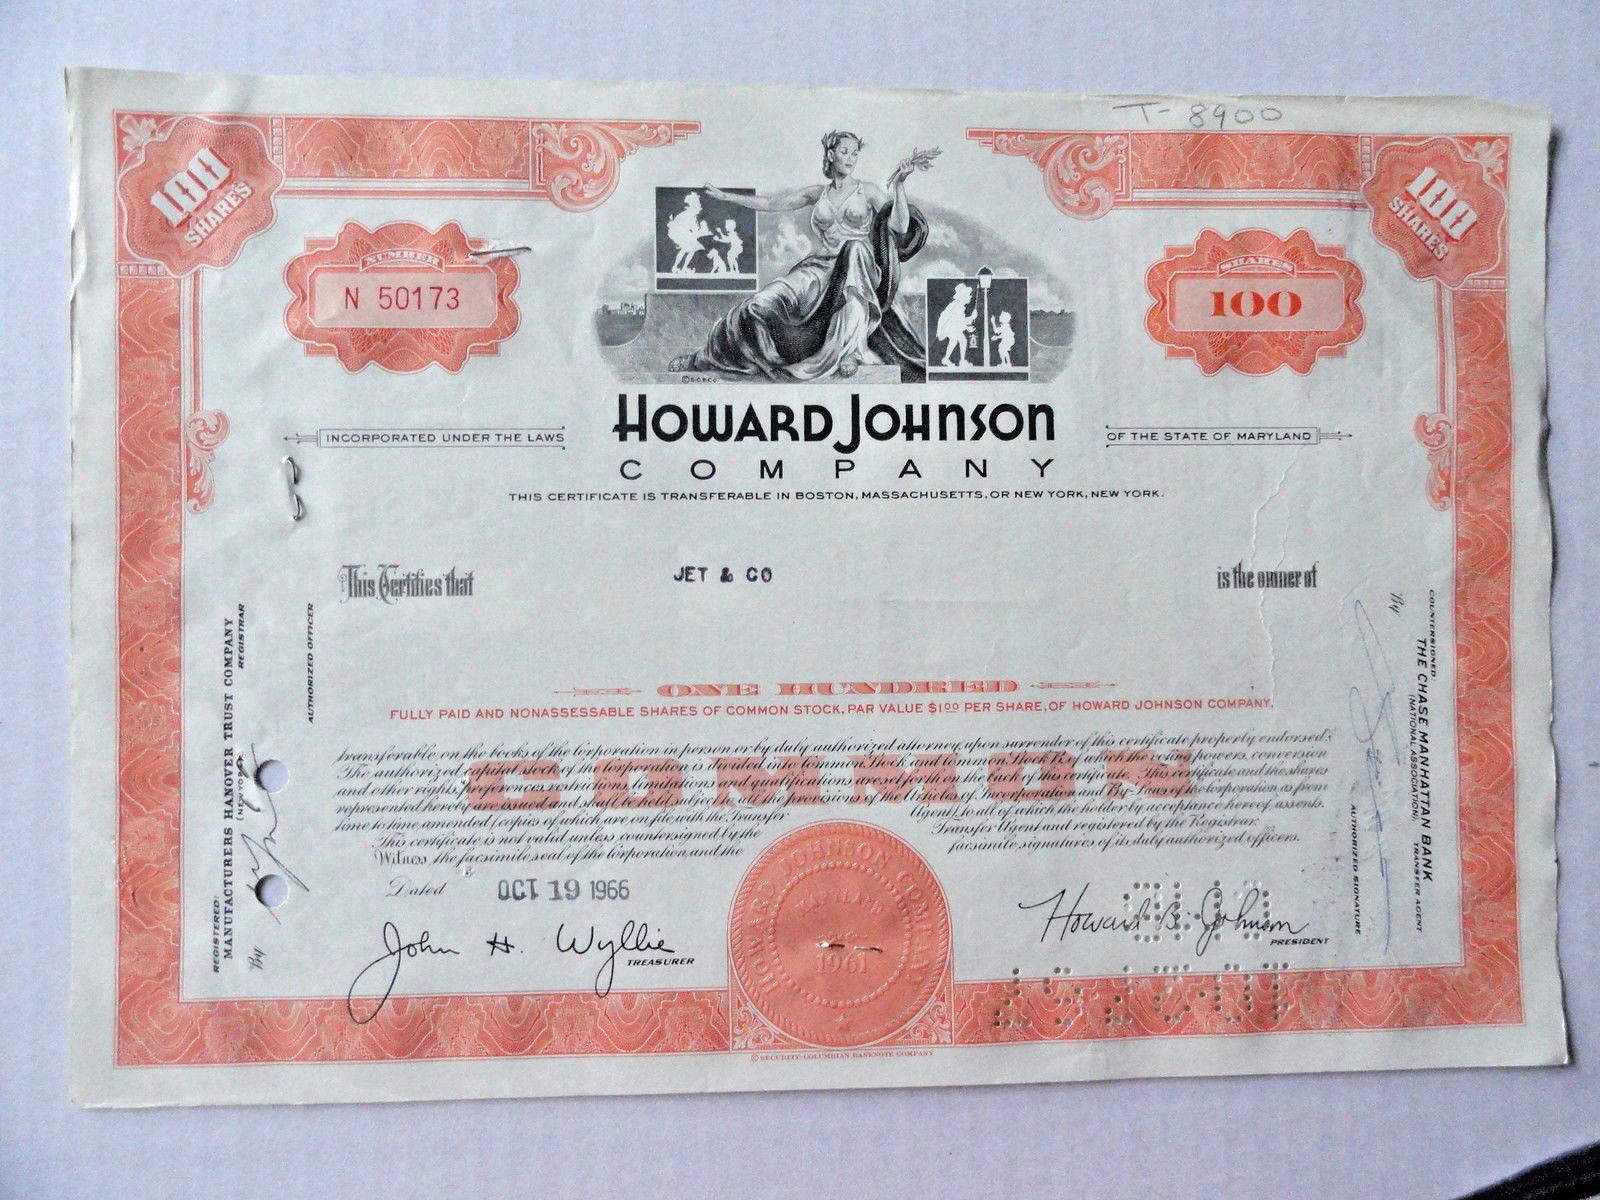 87f3359d7 Howard Johnson Company Stock Certificate 100 and 50 similar items